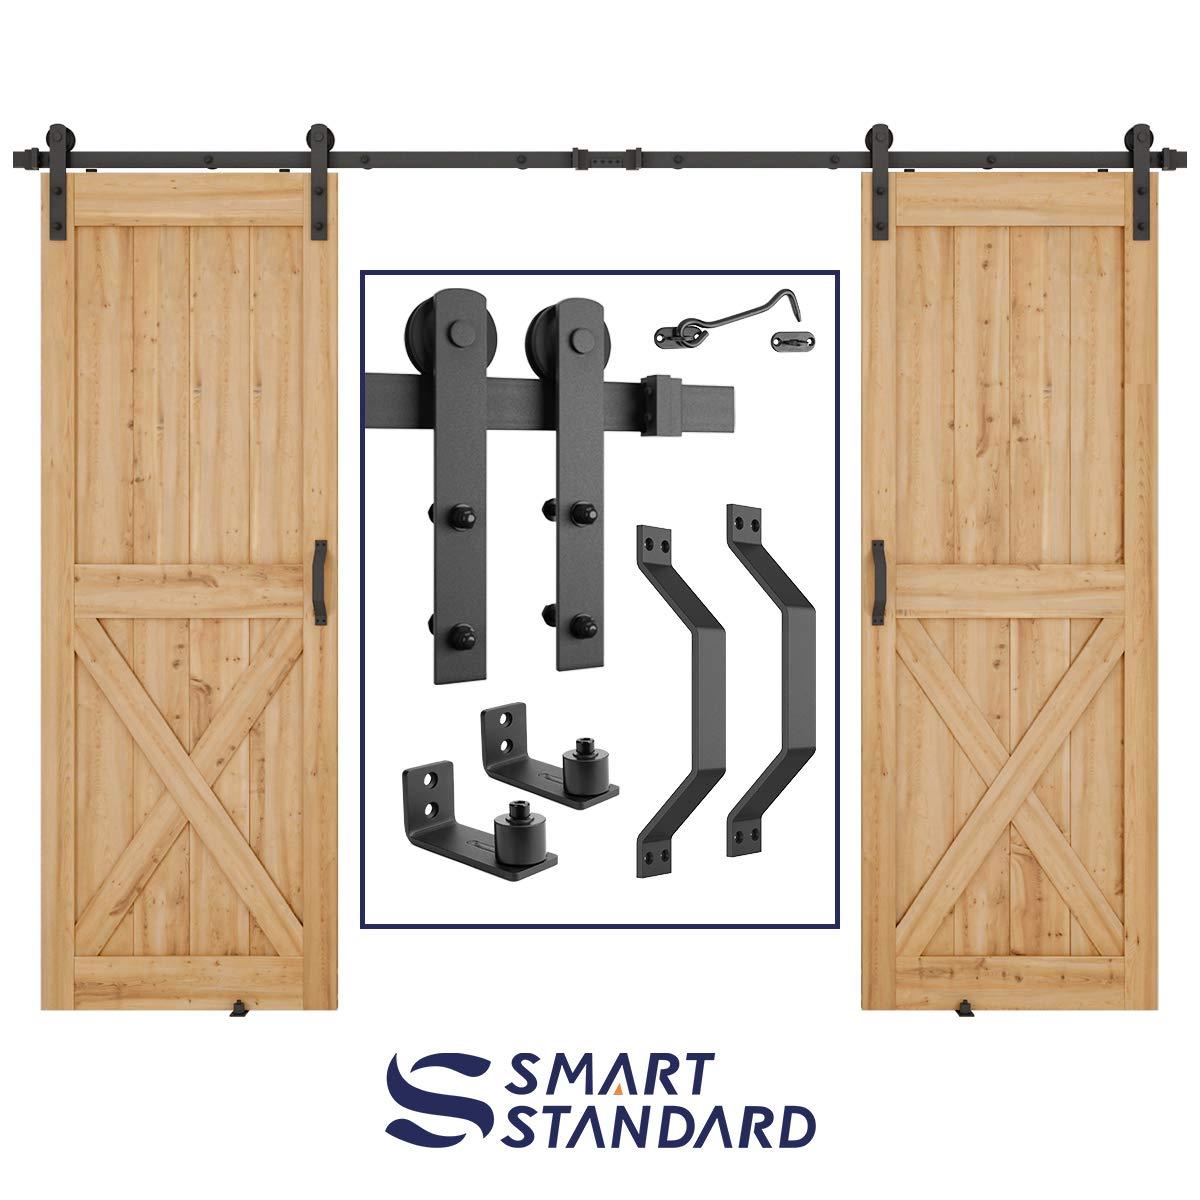 10 FT Heavy Duty Double Gate Sliding Barn Door Hardware Kit, 10ft Double Rail, Black, (Whole Set Includes 2x Pull Handle Set & 2x Floor Guide & 1x Latch Lock) Fit 30'' Wide Door Panel (I Shape Hangers)